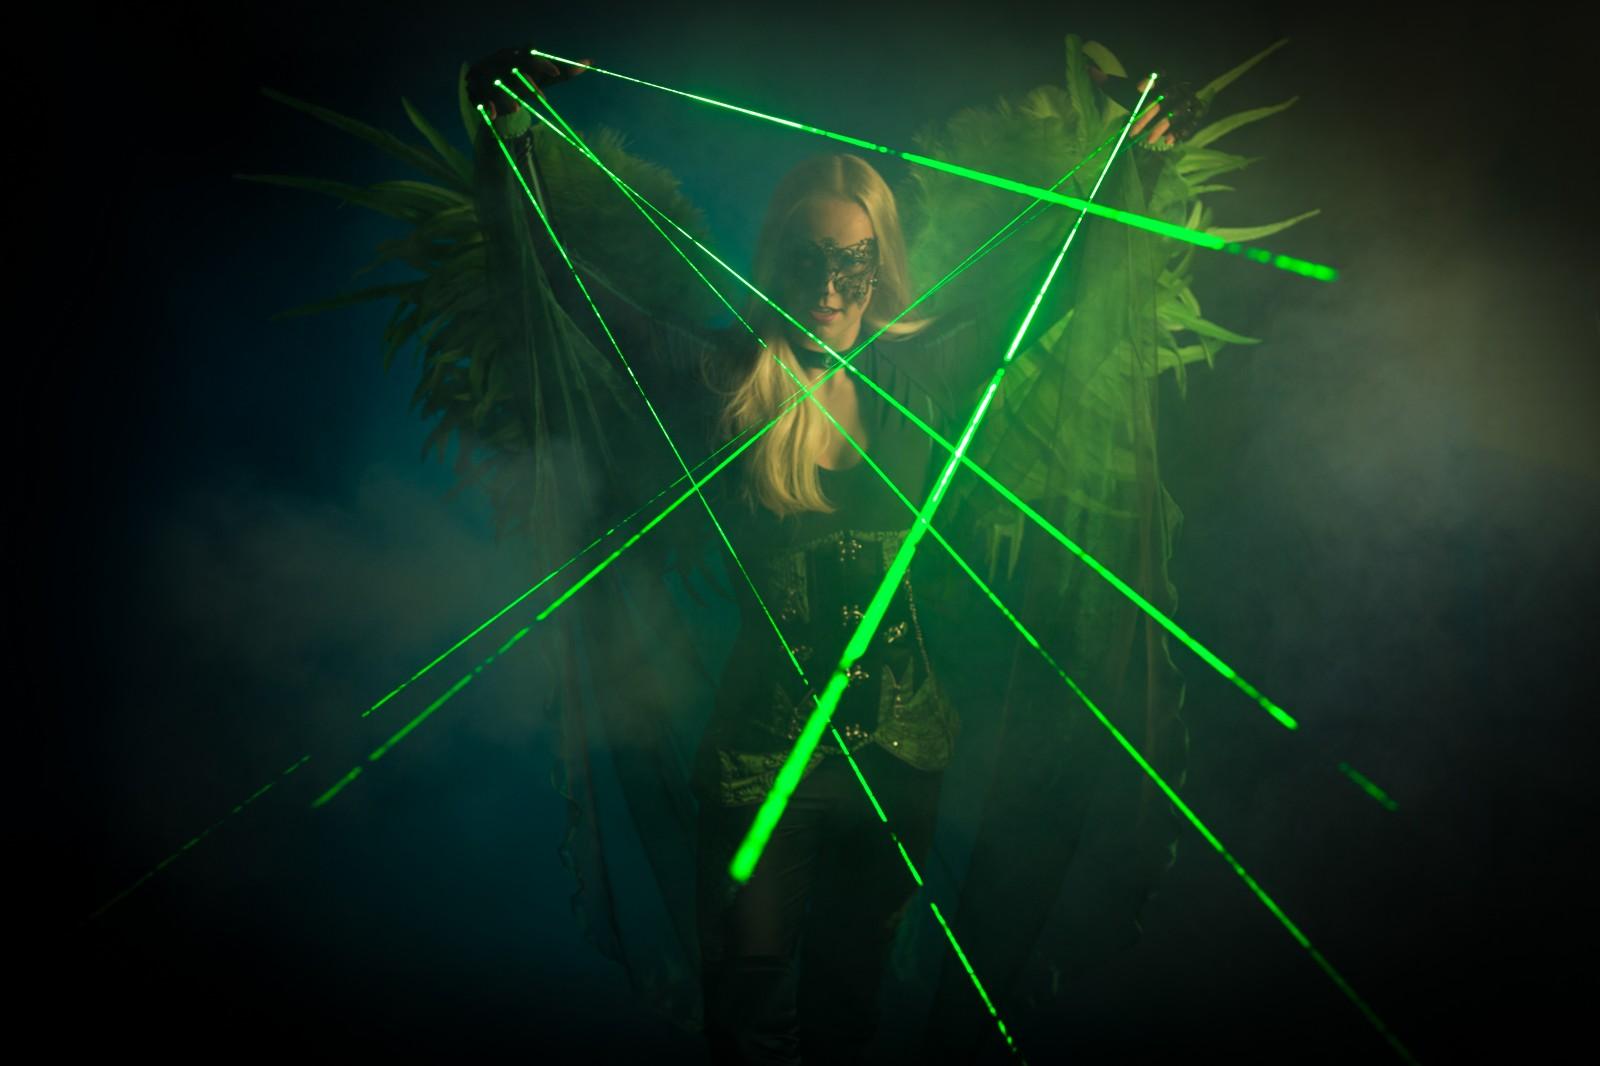 Laser Party, Lasershow, Disco Entertainment, Club Promotie, Entertainment, Dansact, Green Lasershow, Themadame, Laser Angel.